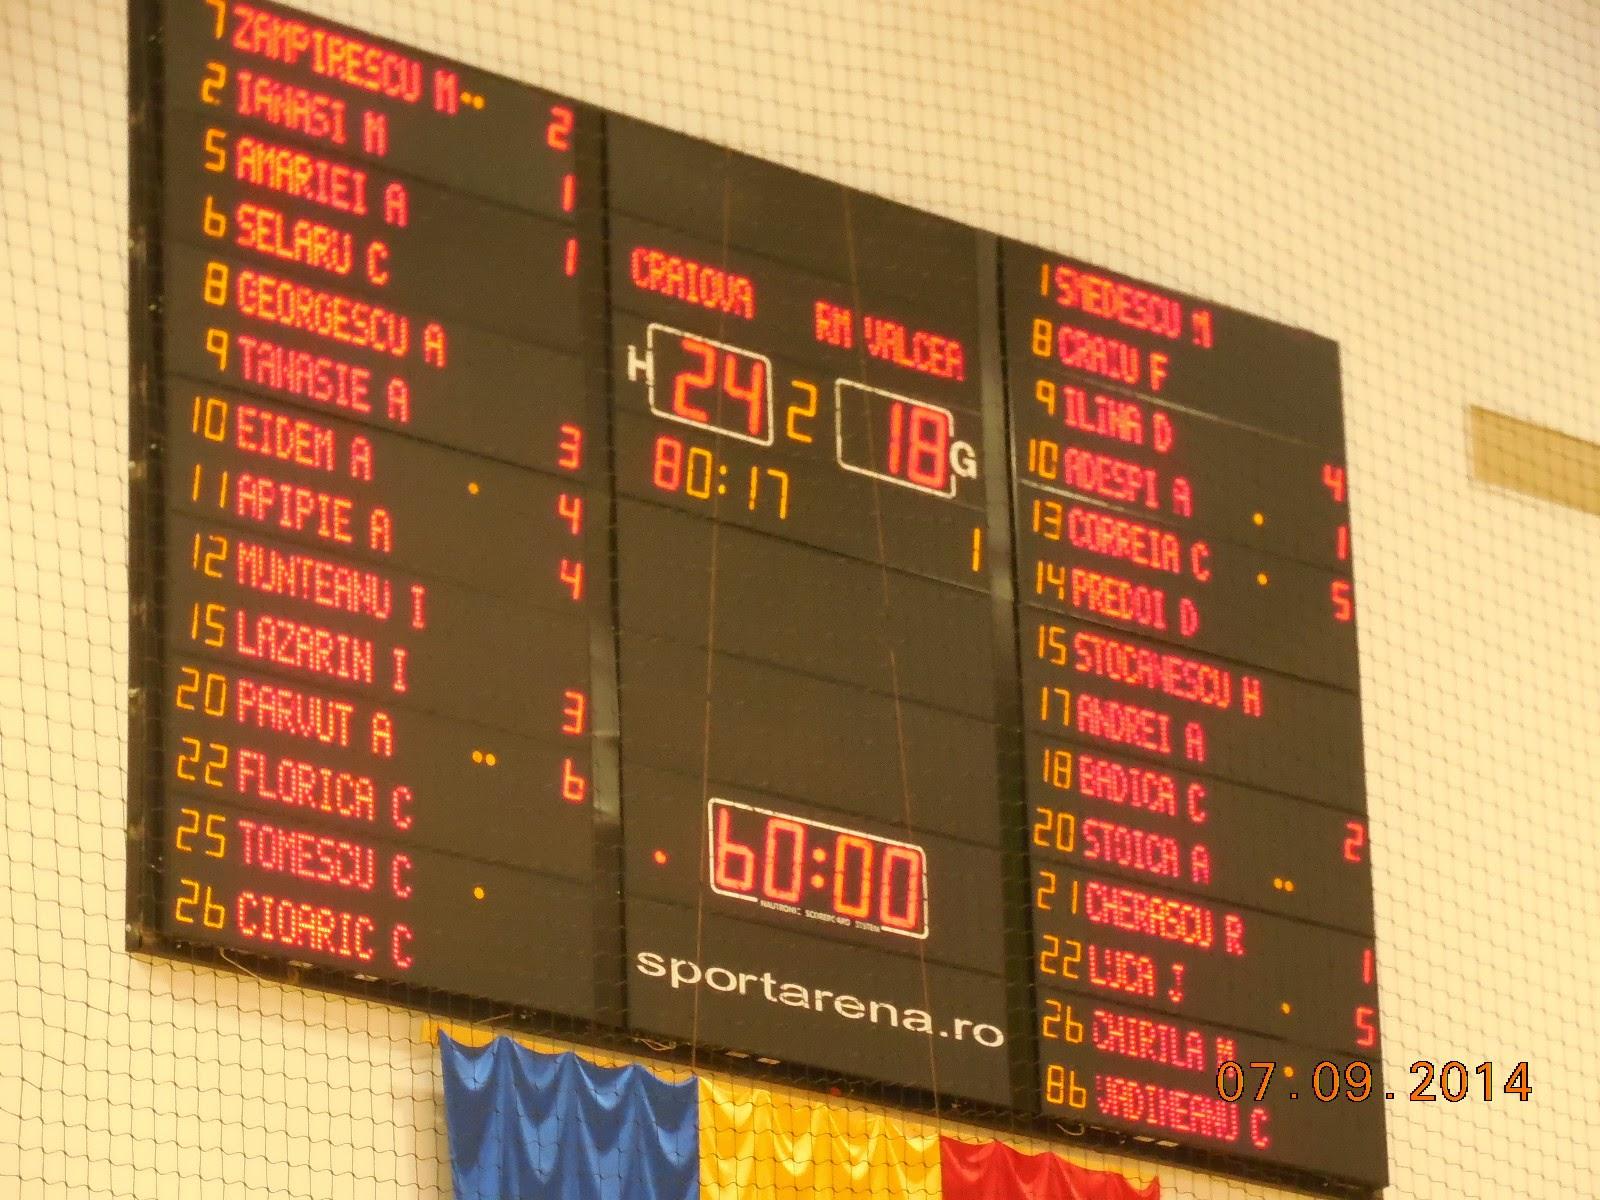 scor final SCM Craiova 24 - Rm Valcea 18